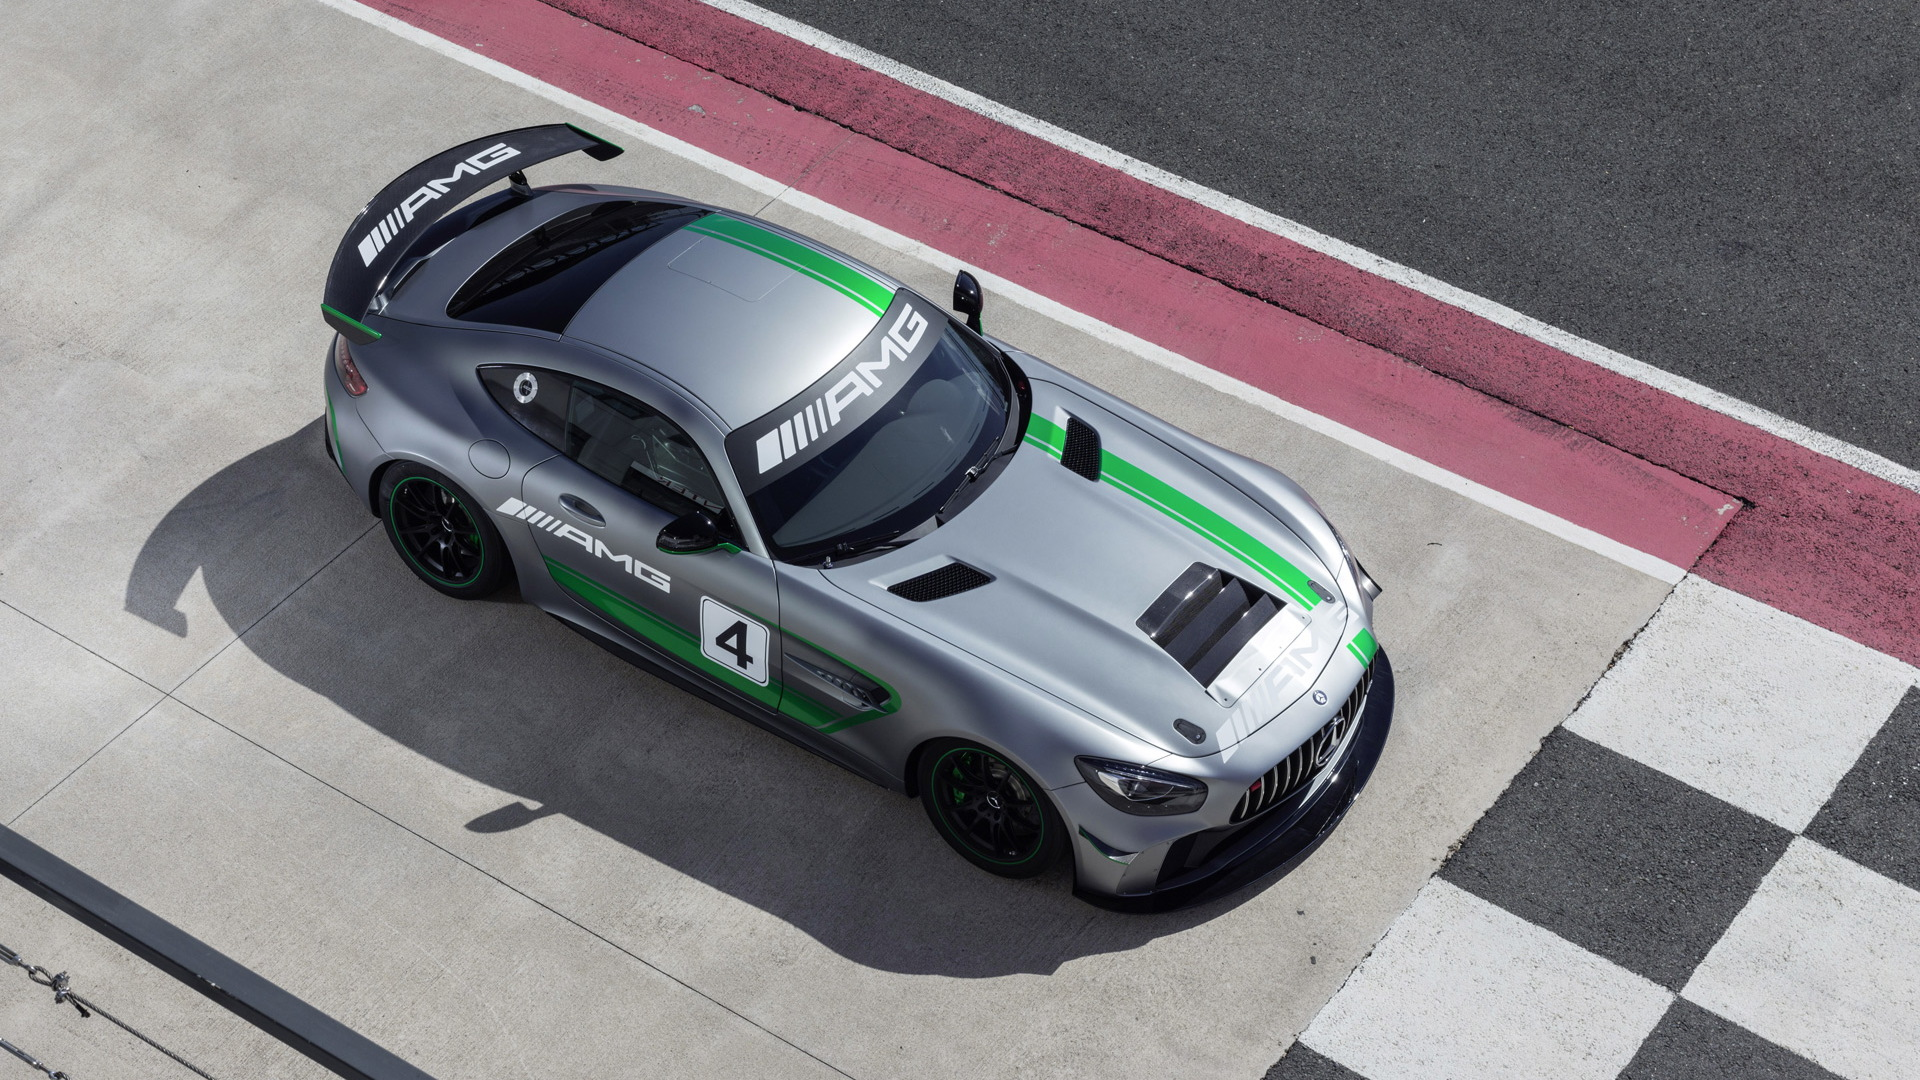 2018 Mercedes-AMG GT4 race car